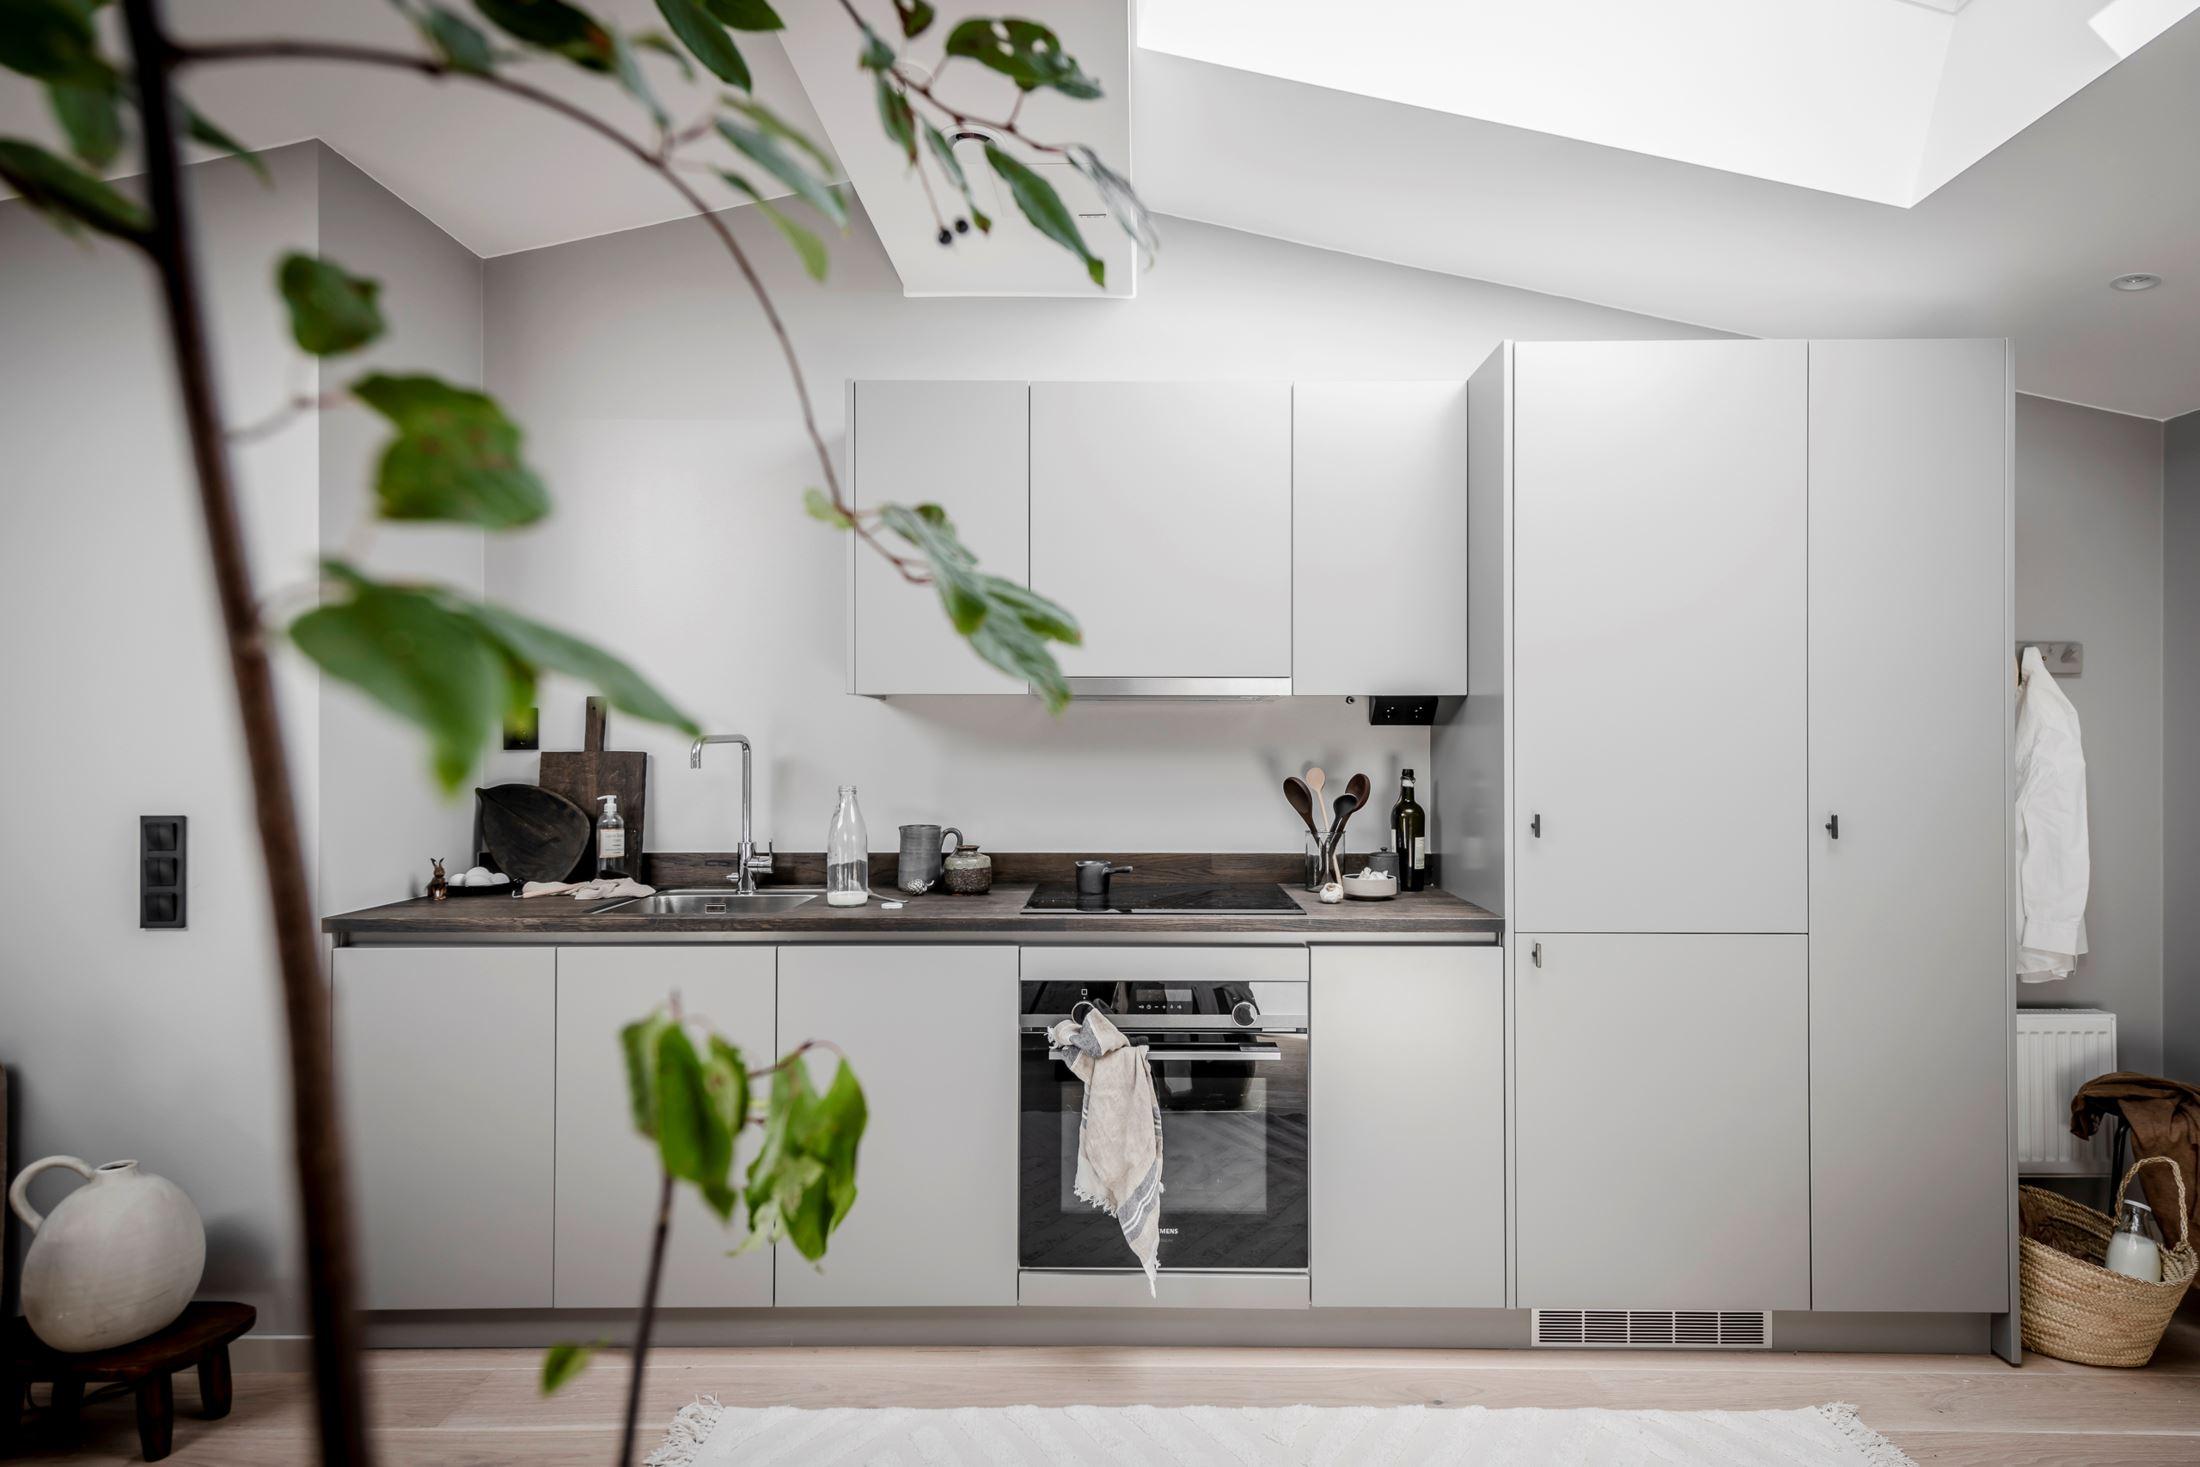 Plan deschis și decor nordic într o garsonieră la mansardă 35 m² 3